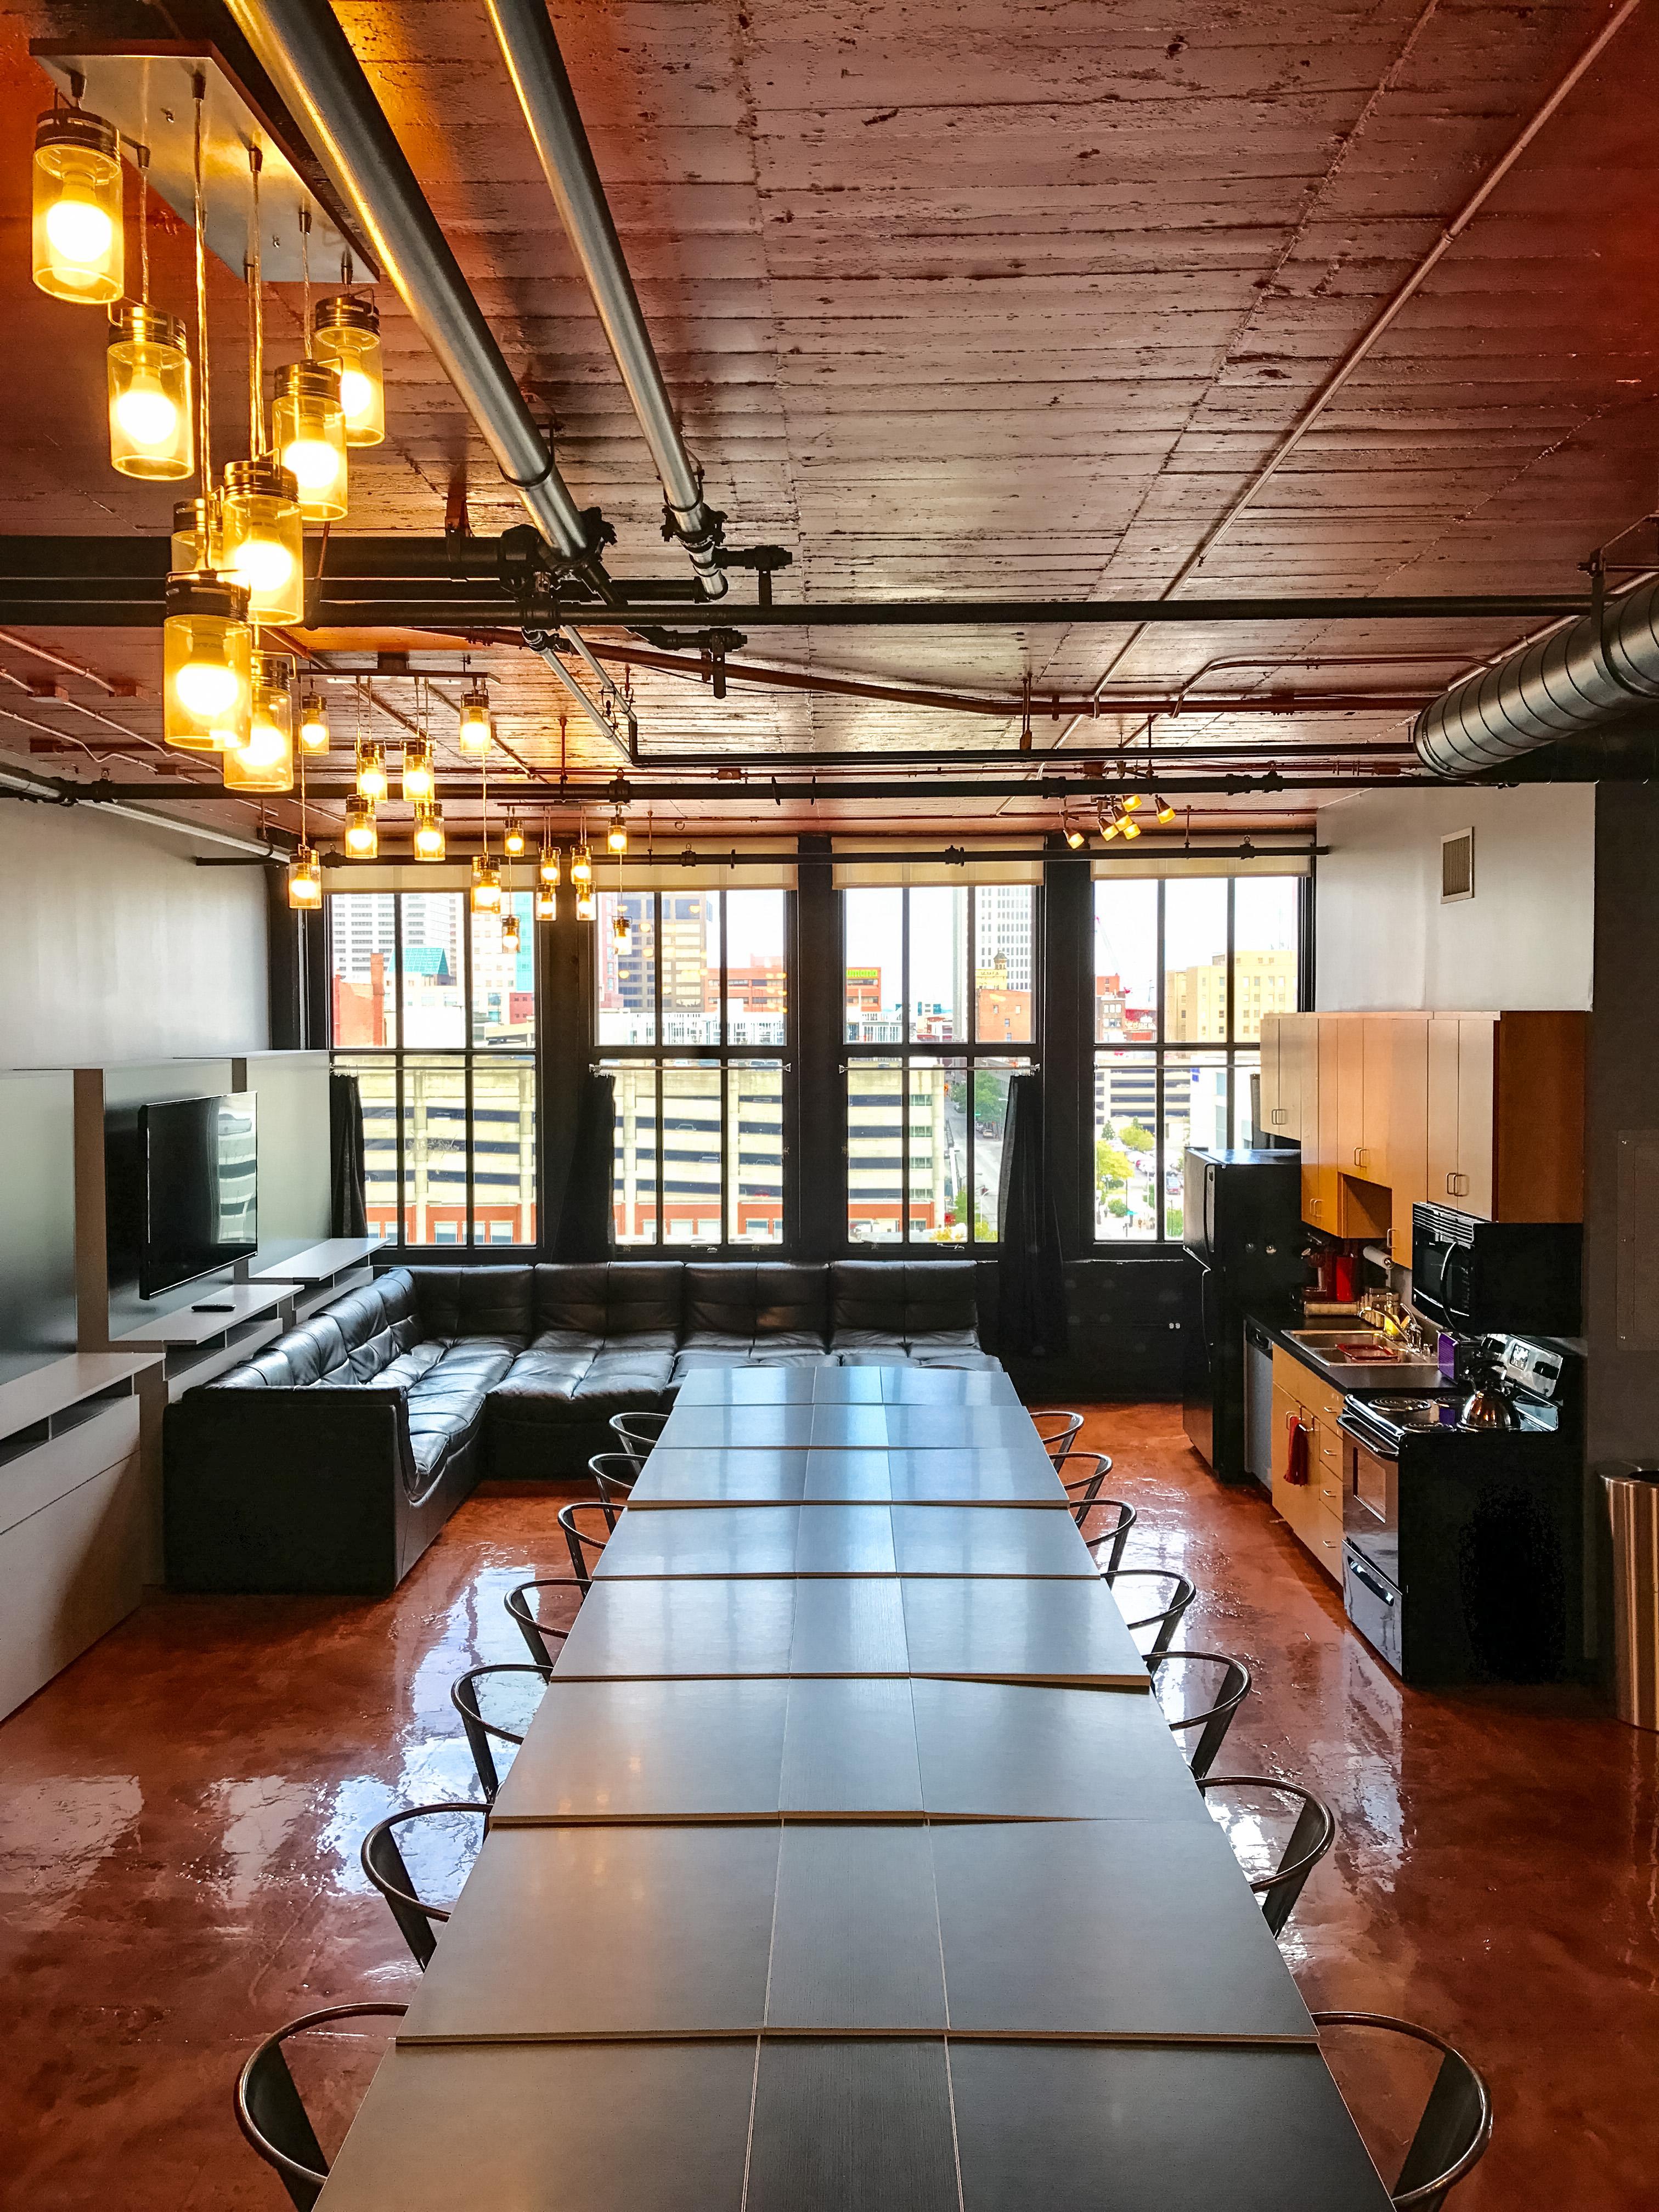 LOFT 714 MEETINGS + EVENTS